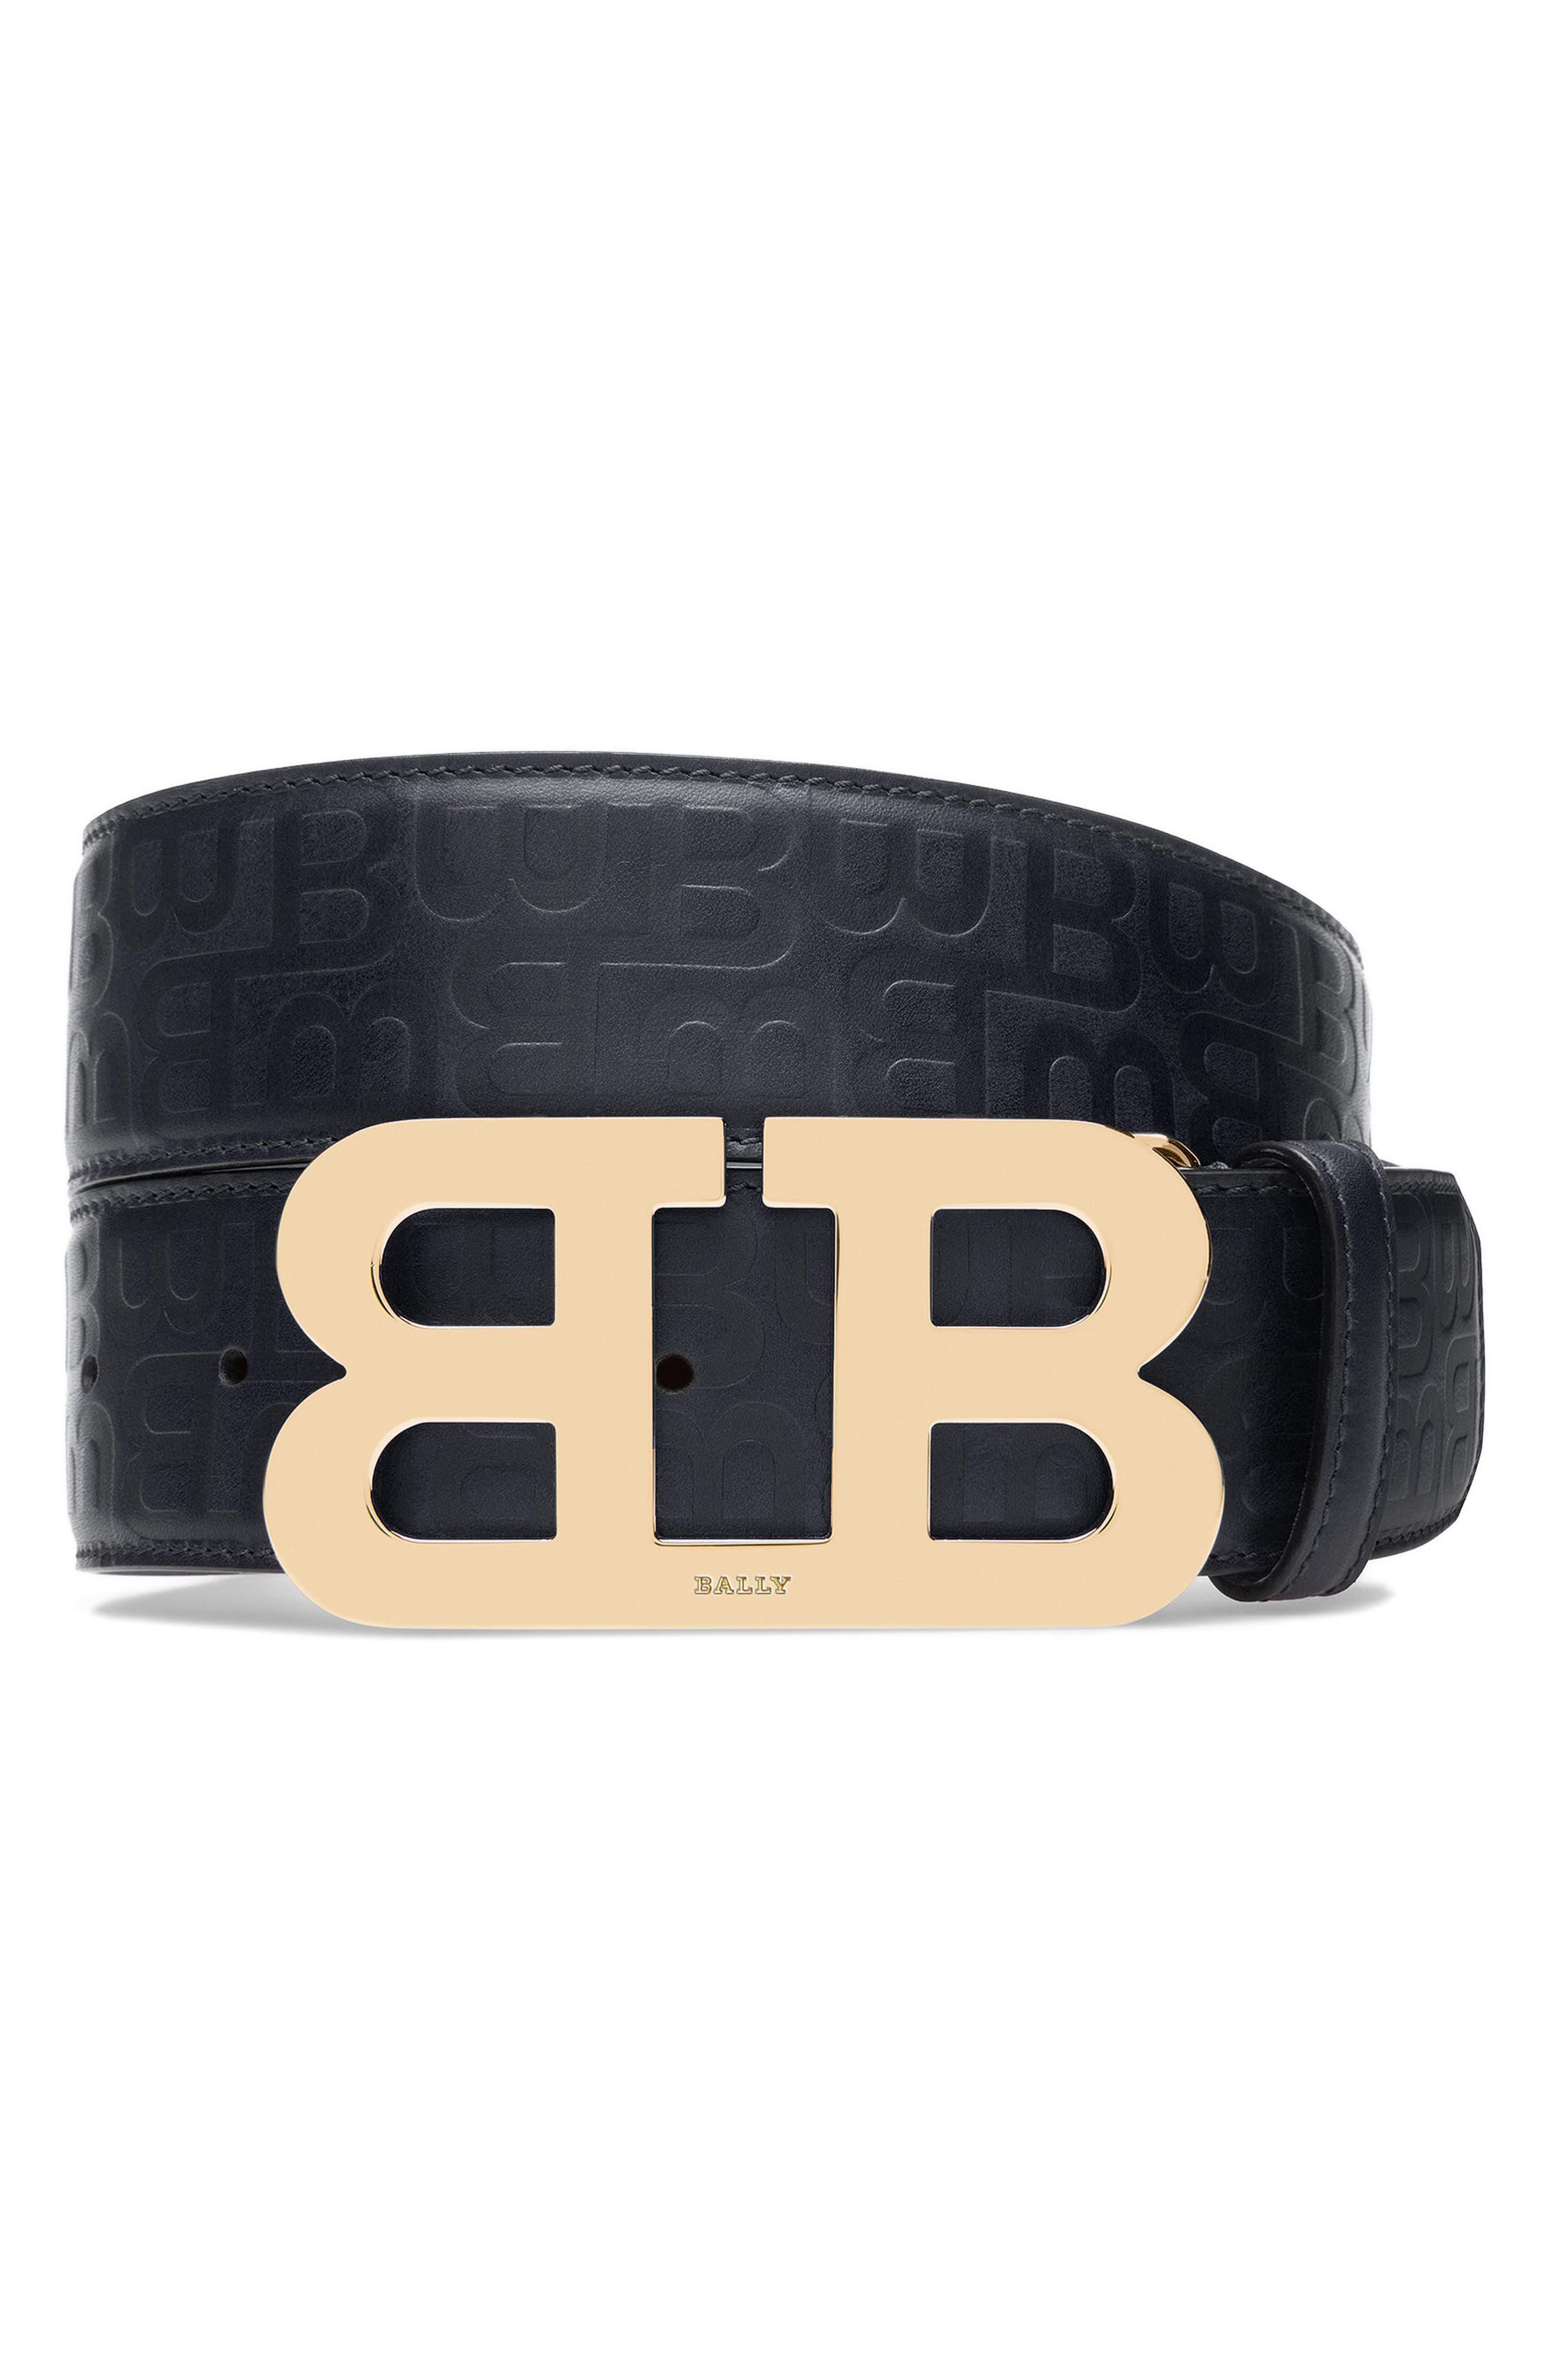 Alternate Image 1 Selected - Bally Stamped Logo Leather Belt